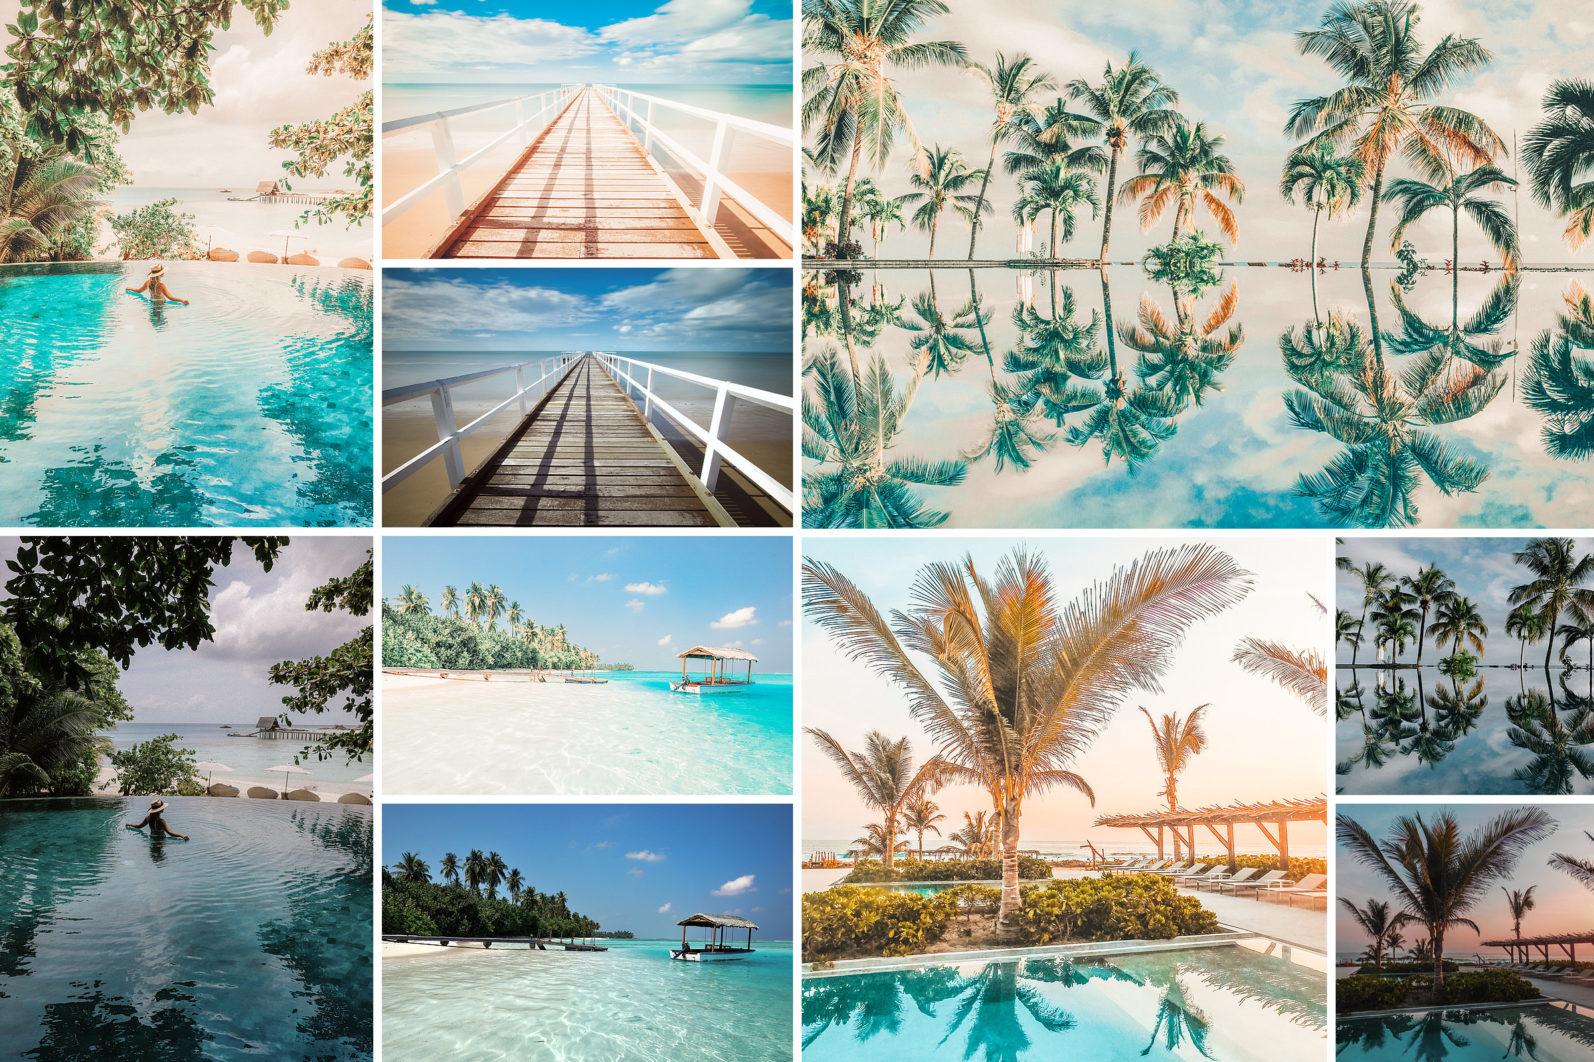 27. Beach Vacation Presets - 27.BEACHVACATIONS 3 -